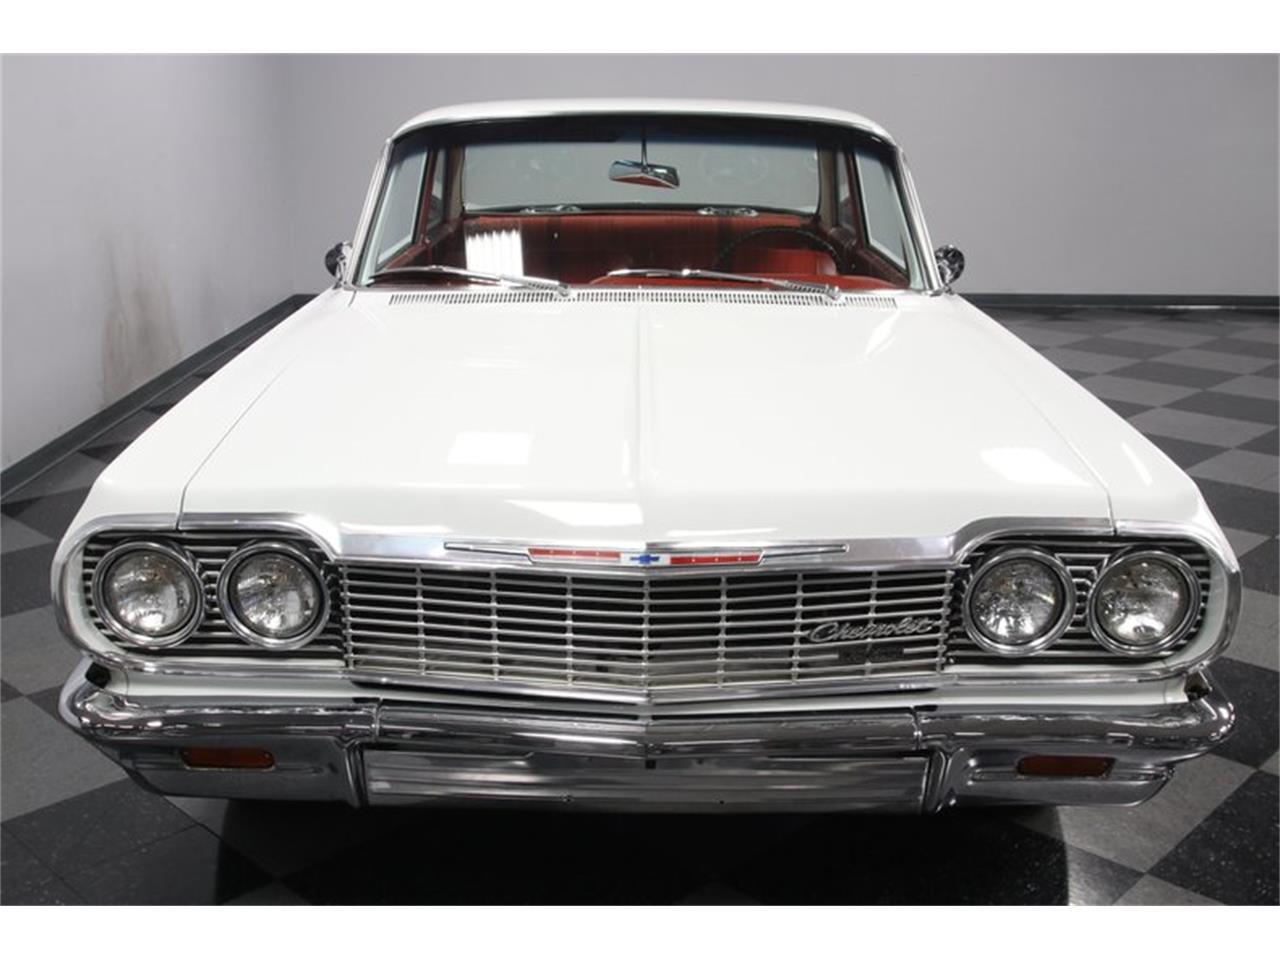 1964 Chevrolet Bel Air (CC-1300182) for sale in Concord, North Carolina